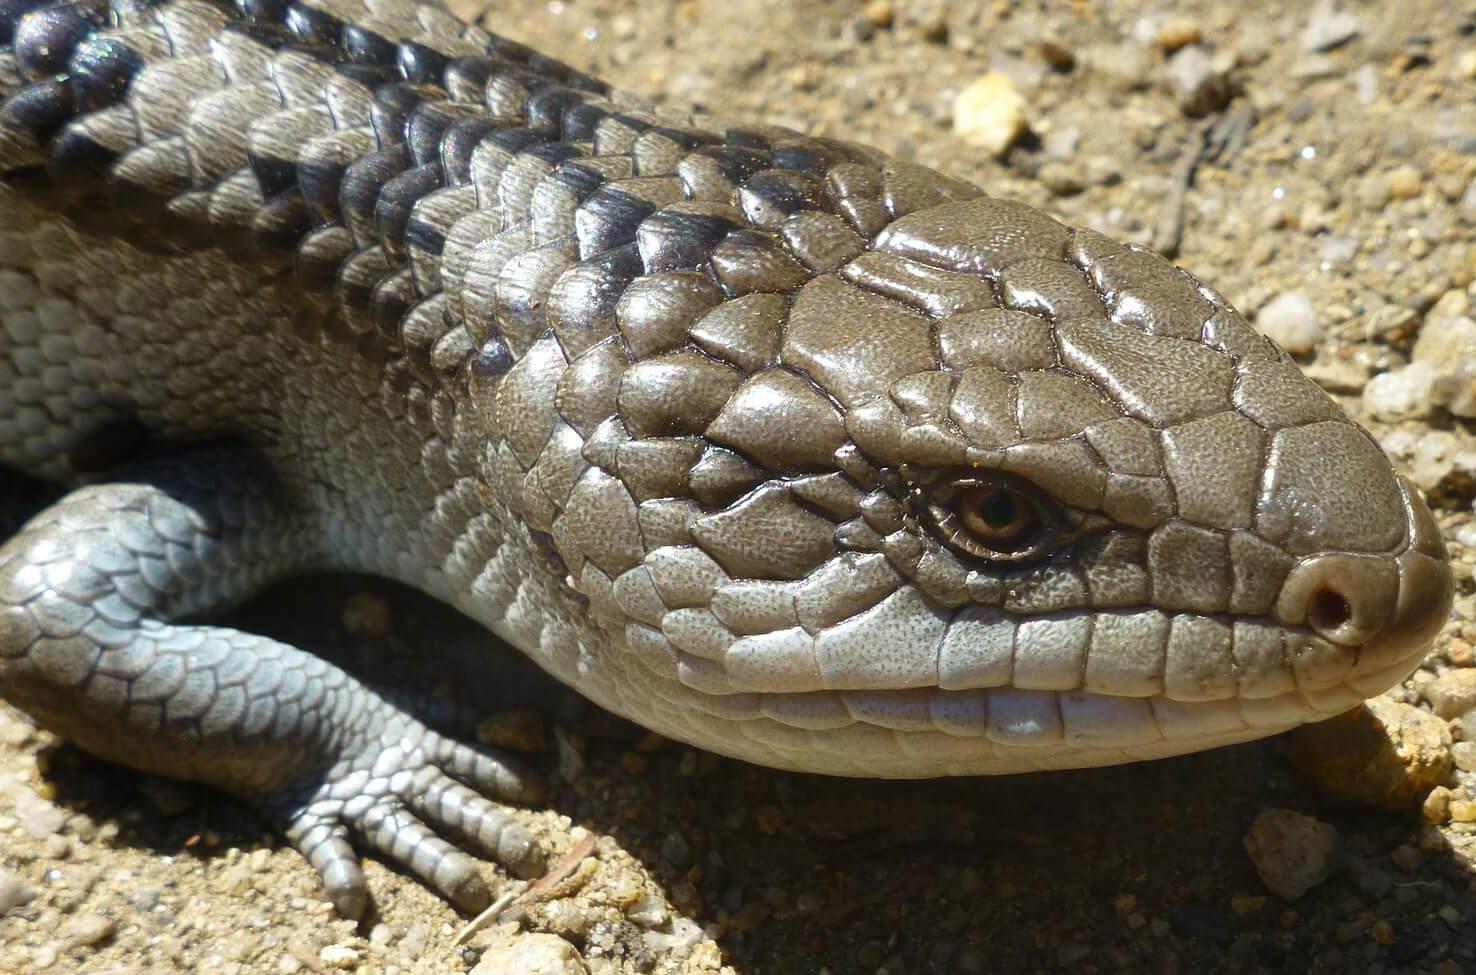 Head of a scaled blue tongue Lizard